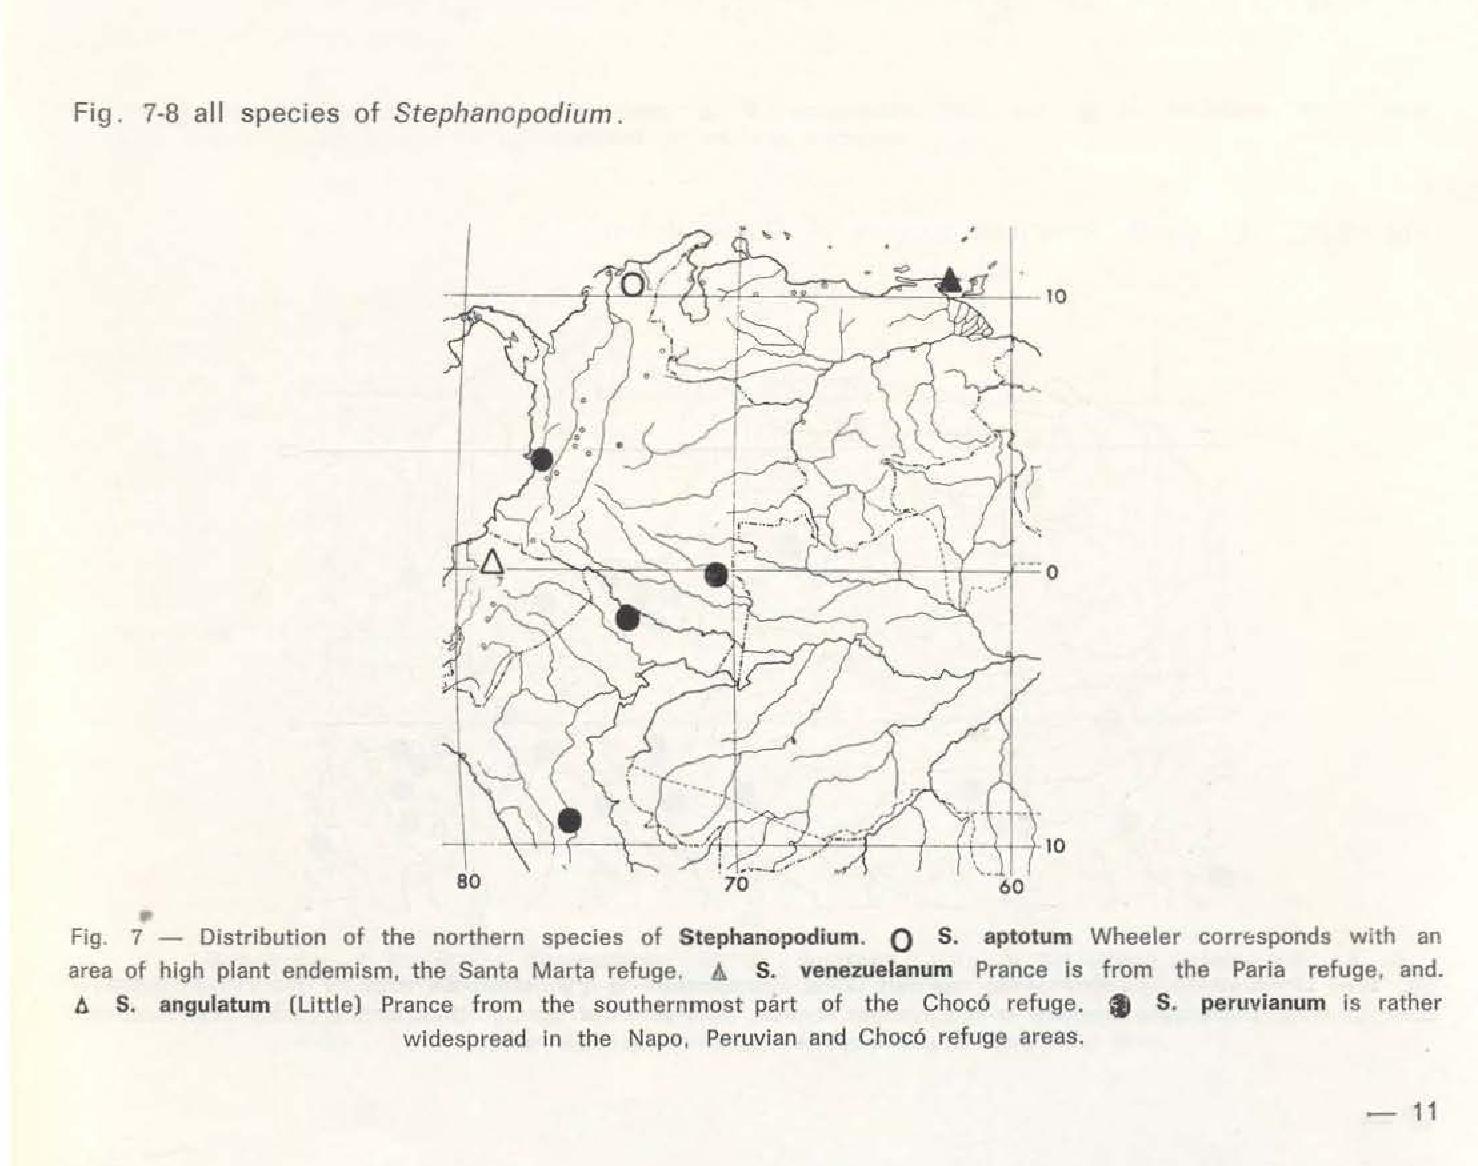 figure 7-8